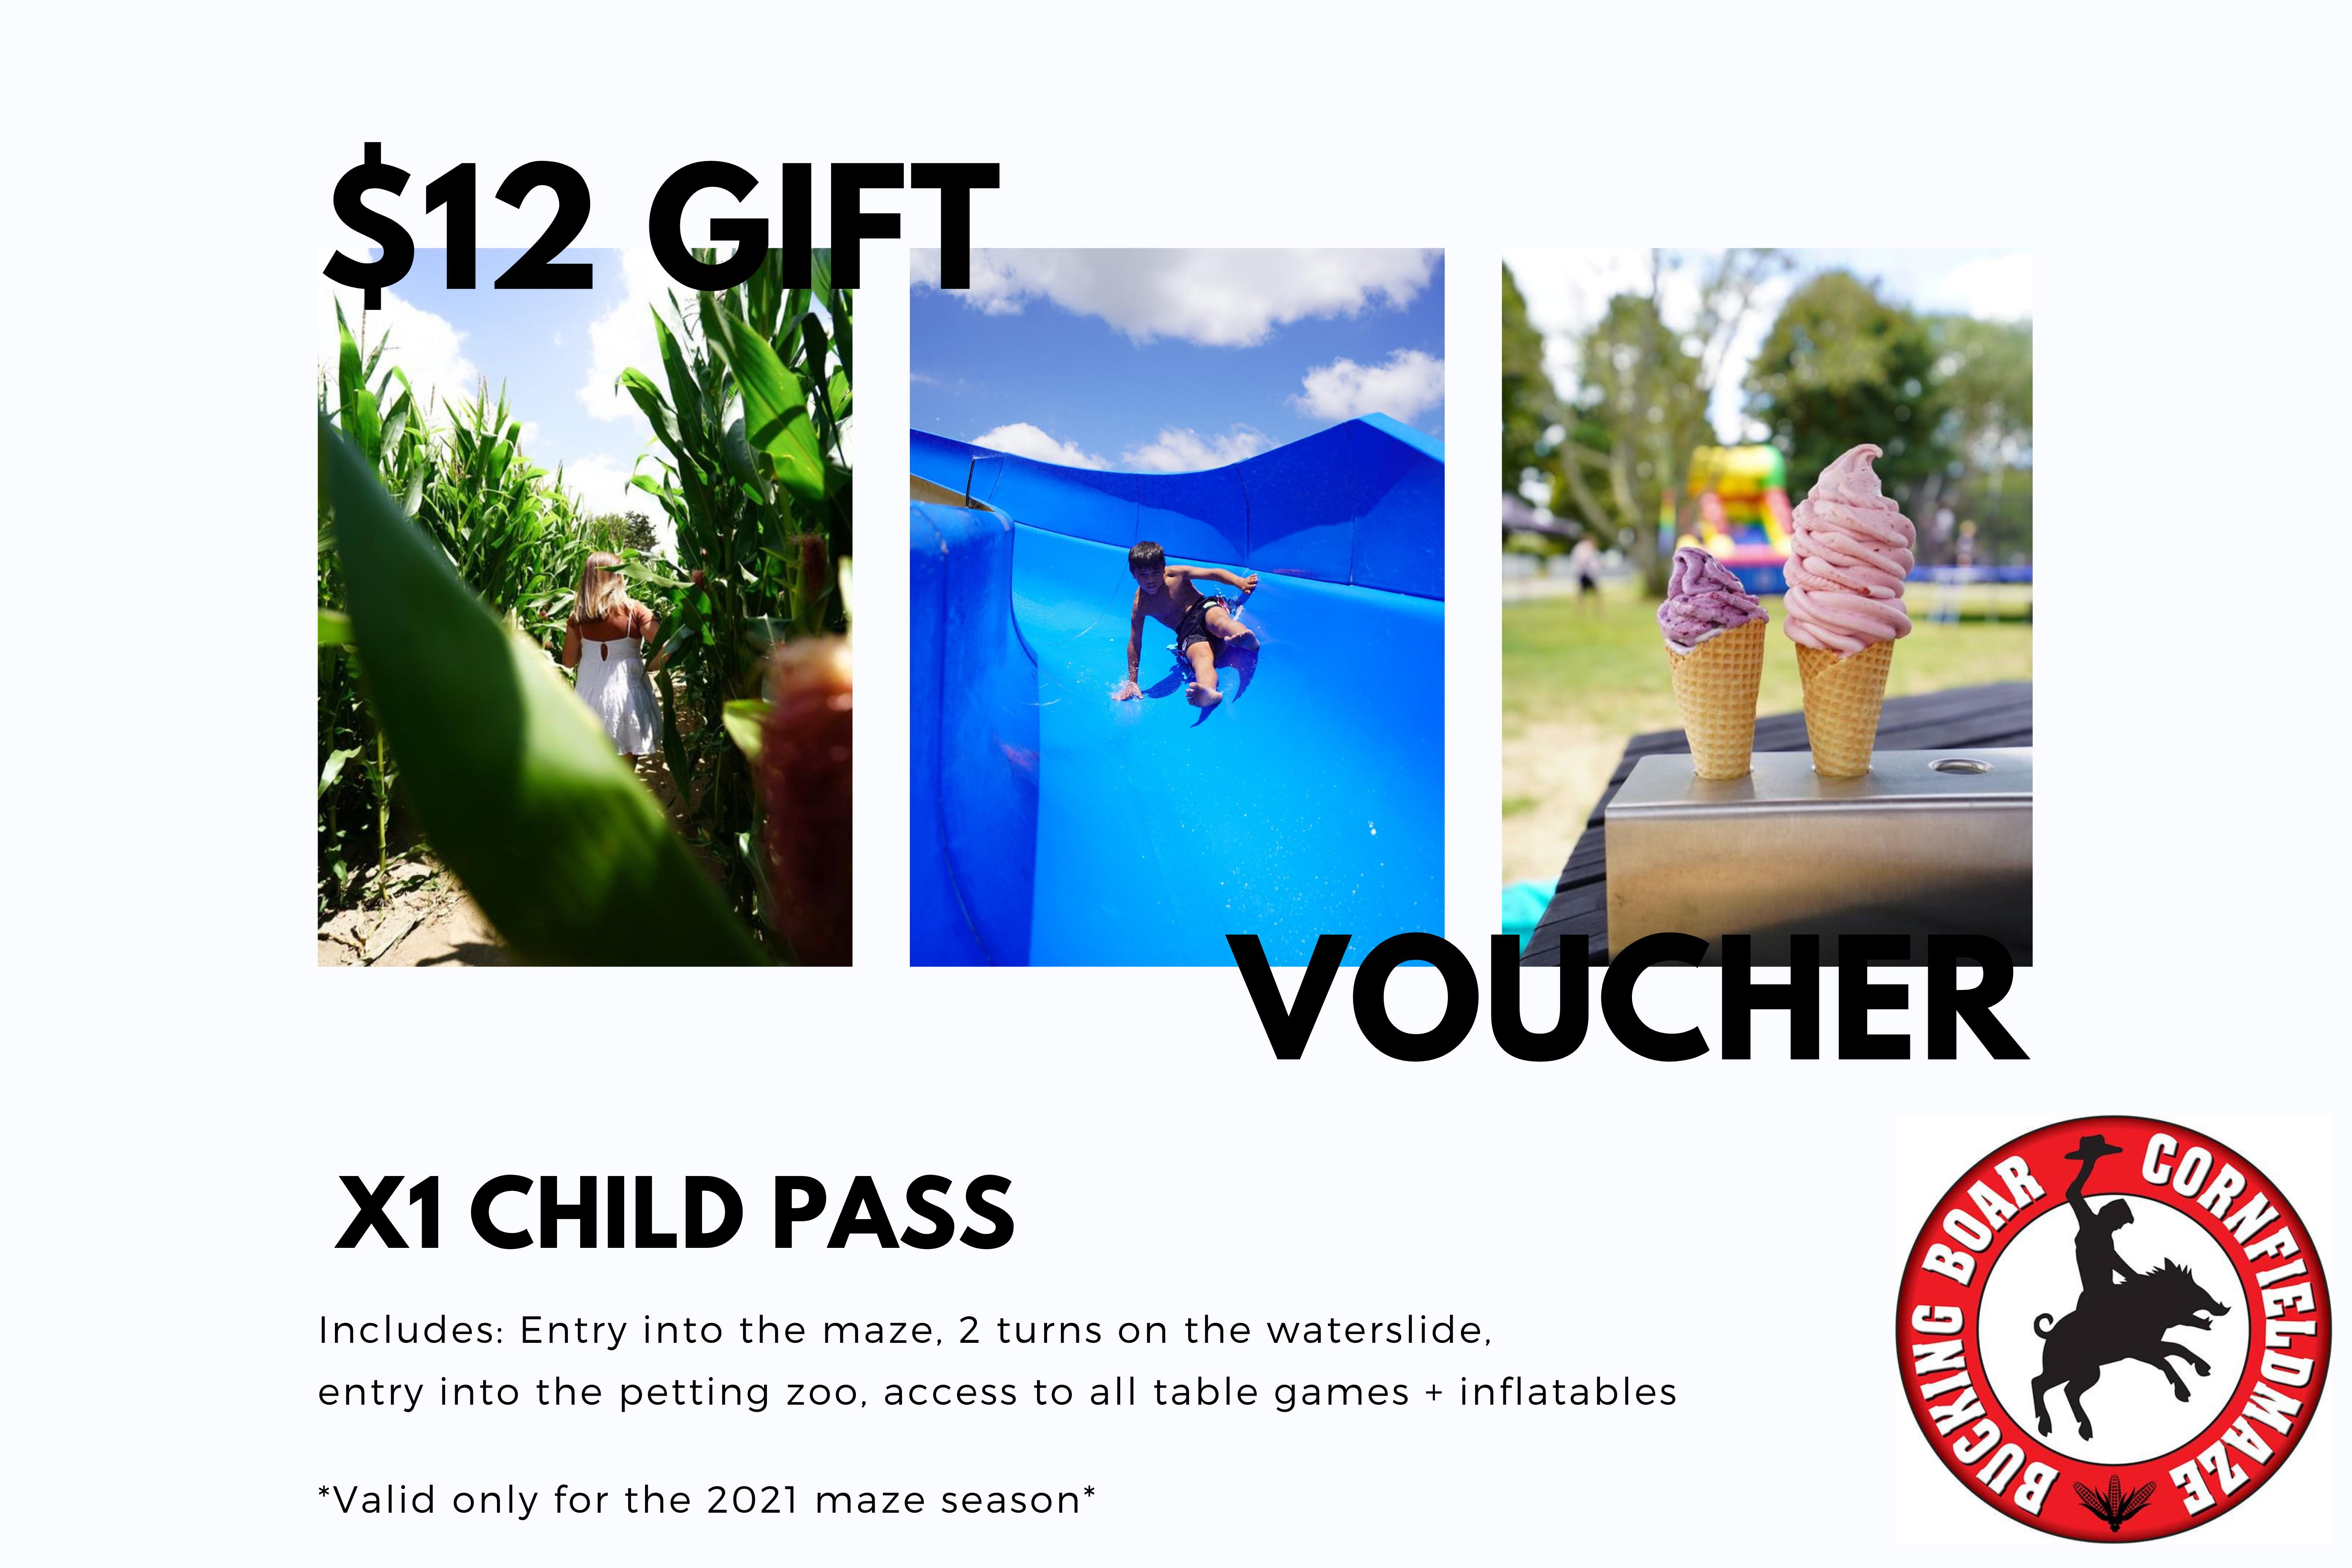 Gift Voucher - Child Pass